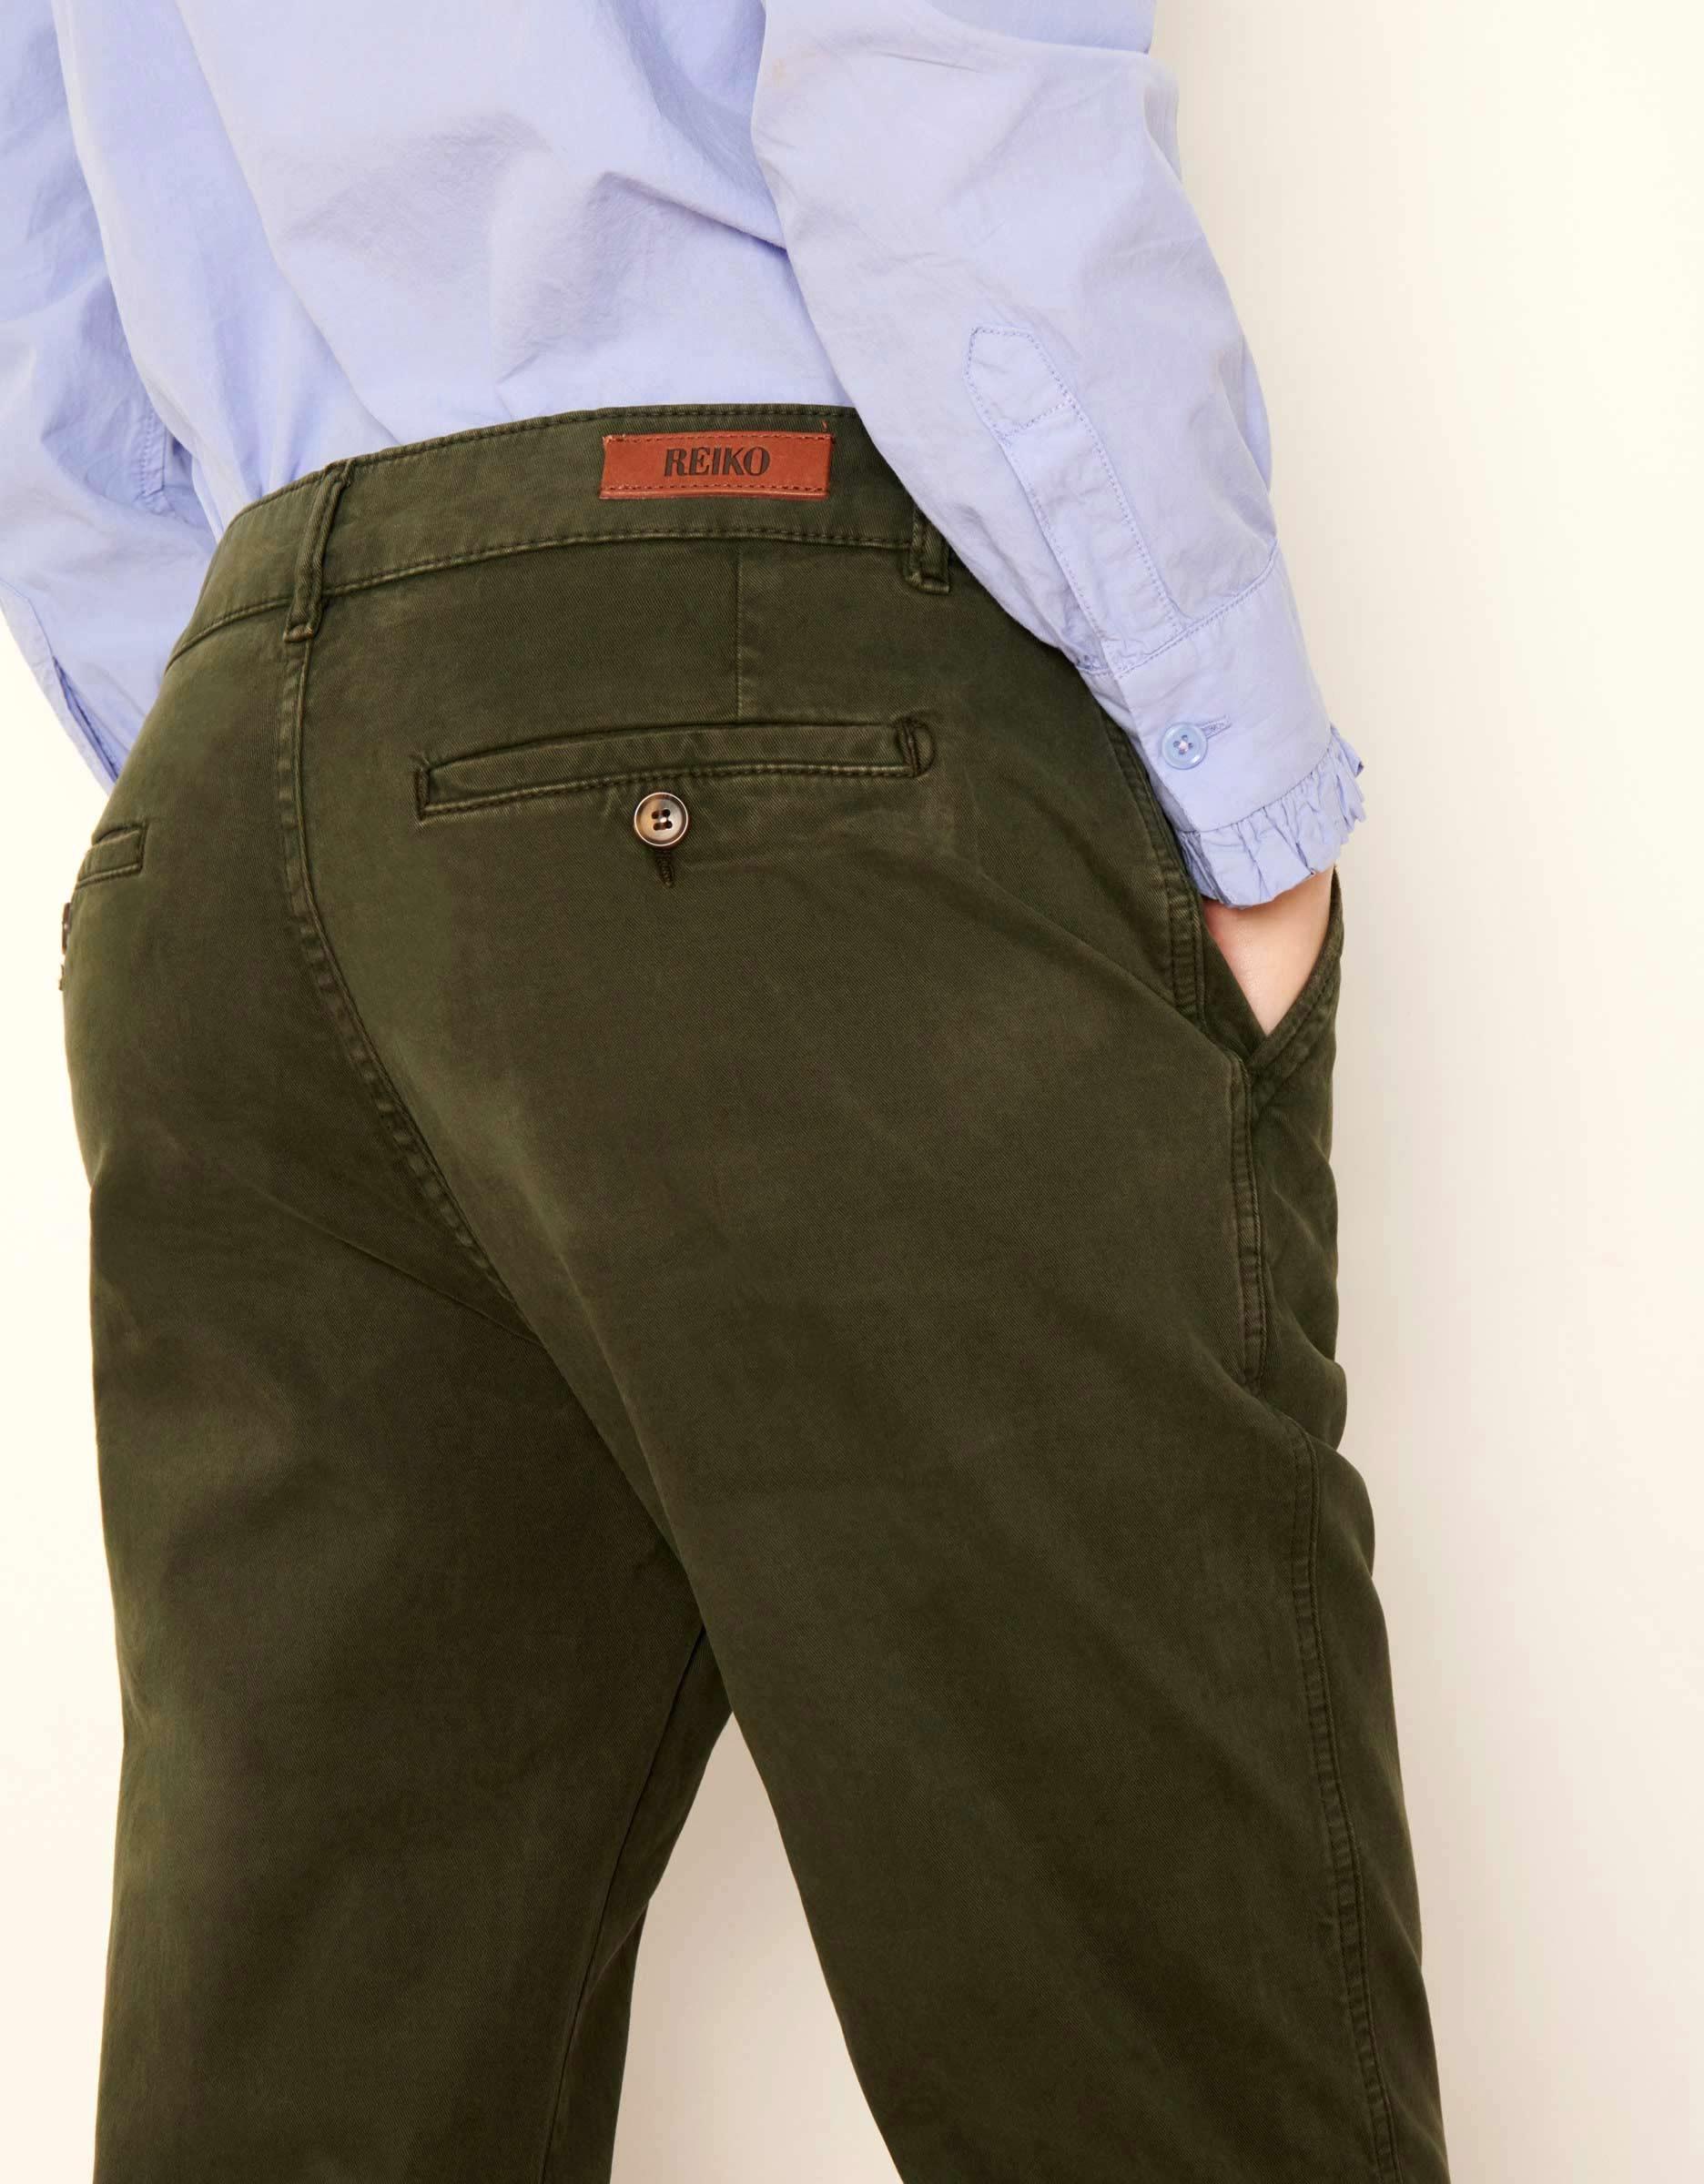 Vert Pantalon De Scott Chrome Femme Reiko Pour Chino Tapered c3TFuJlK1